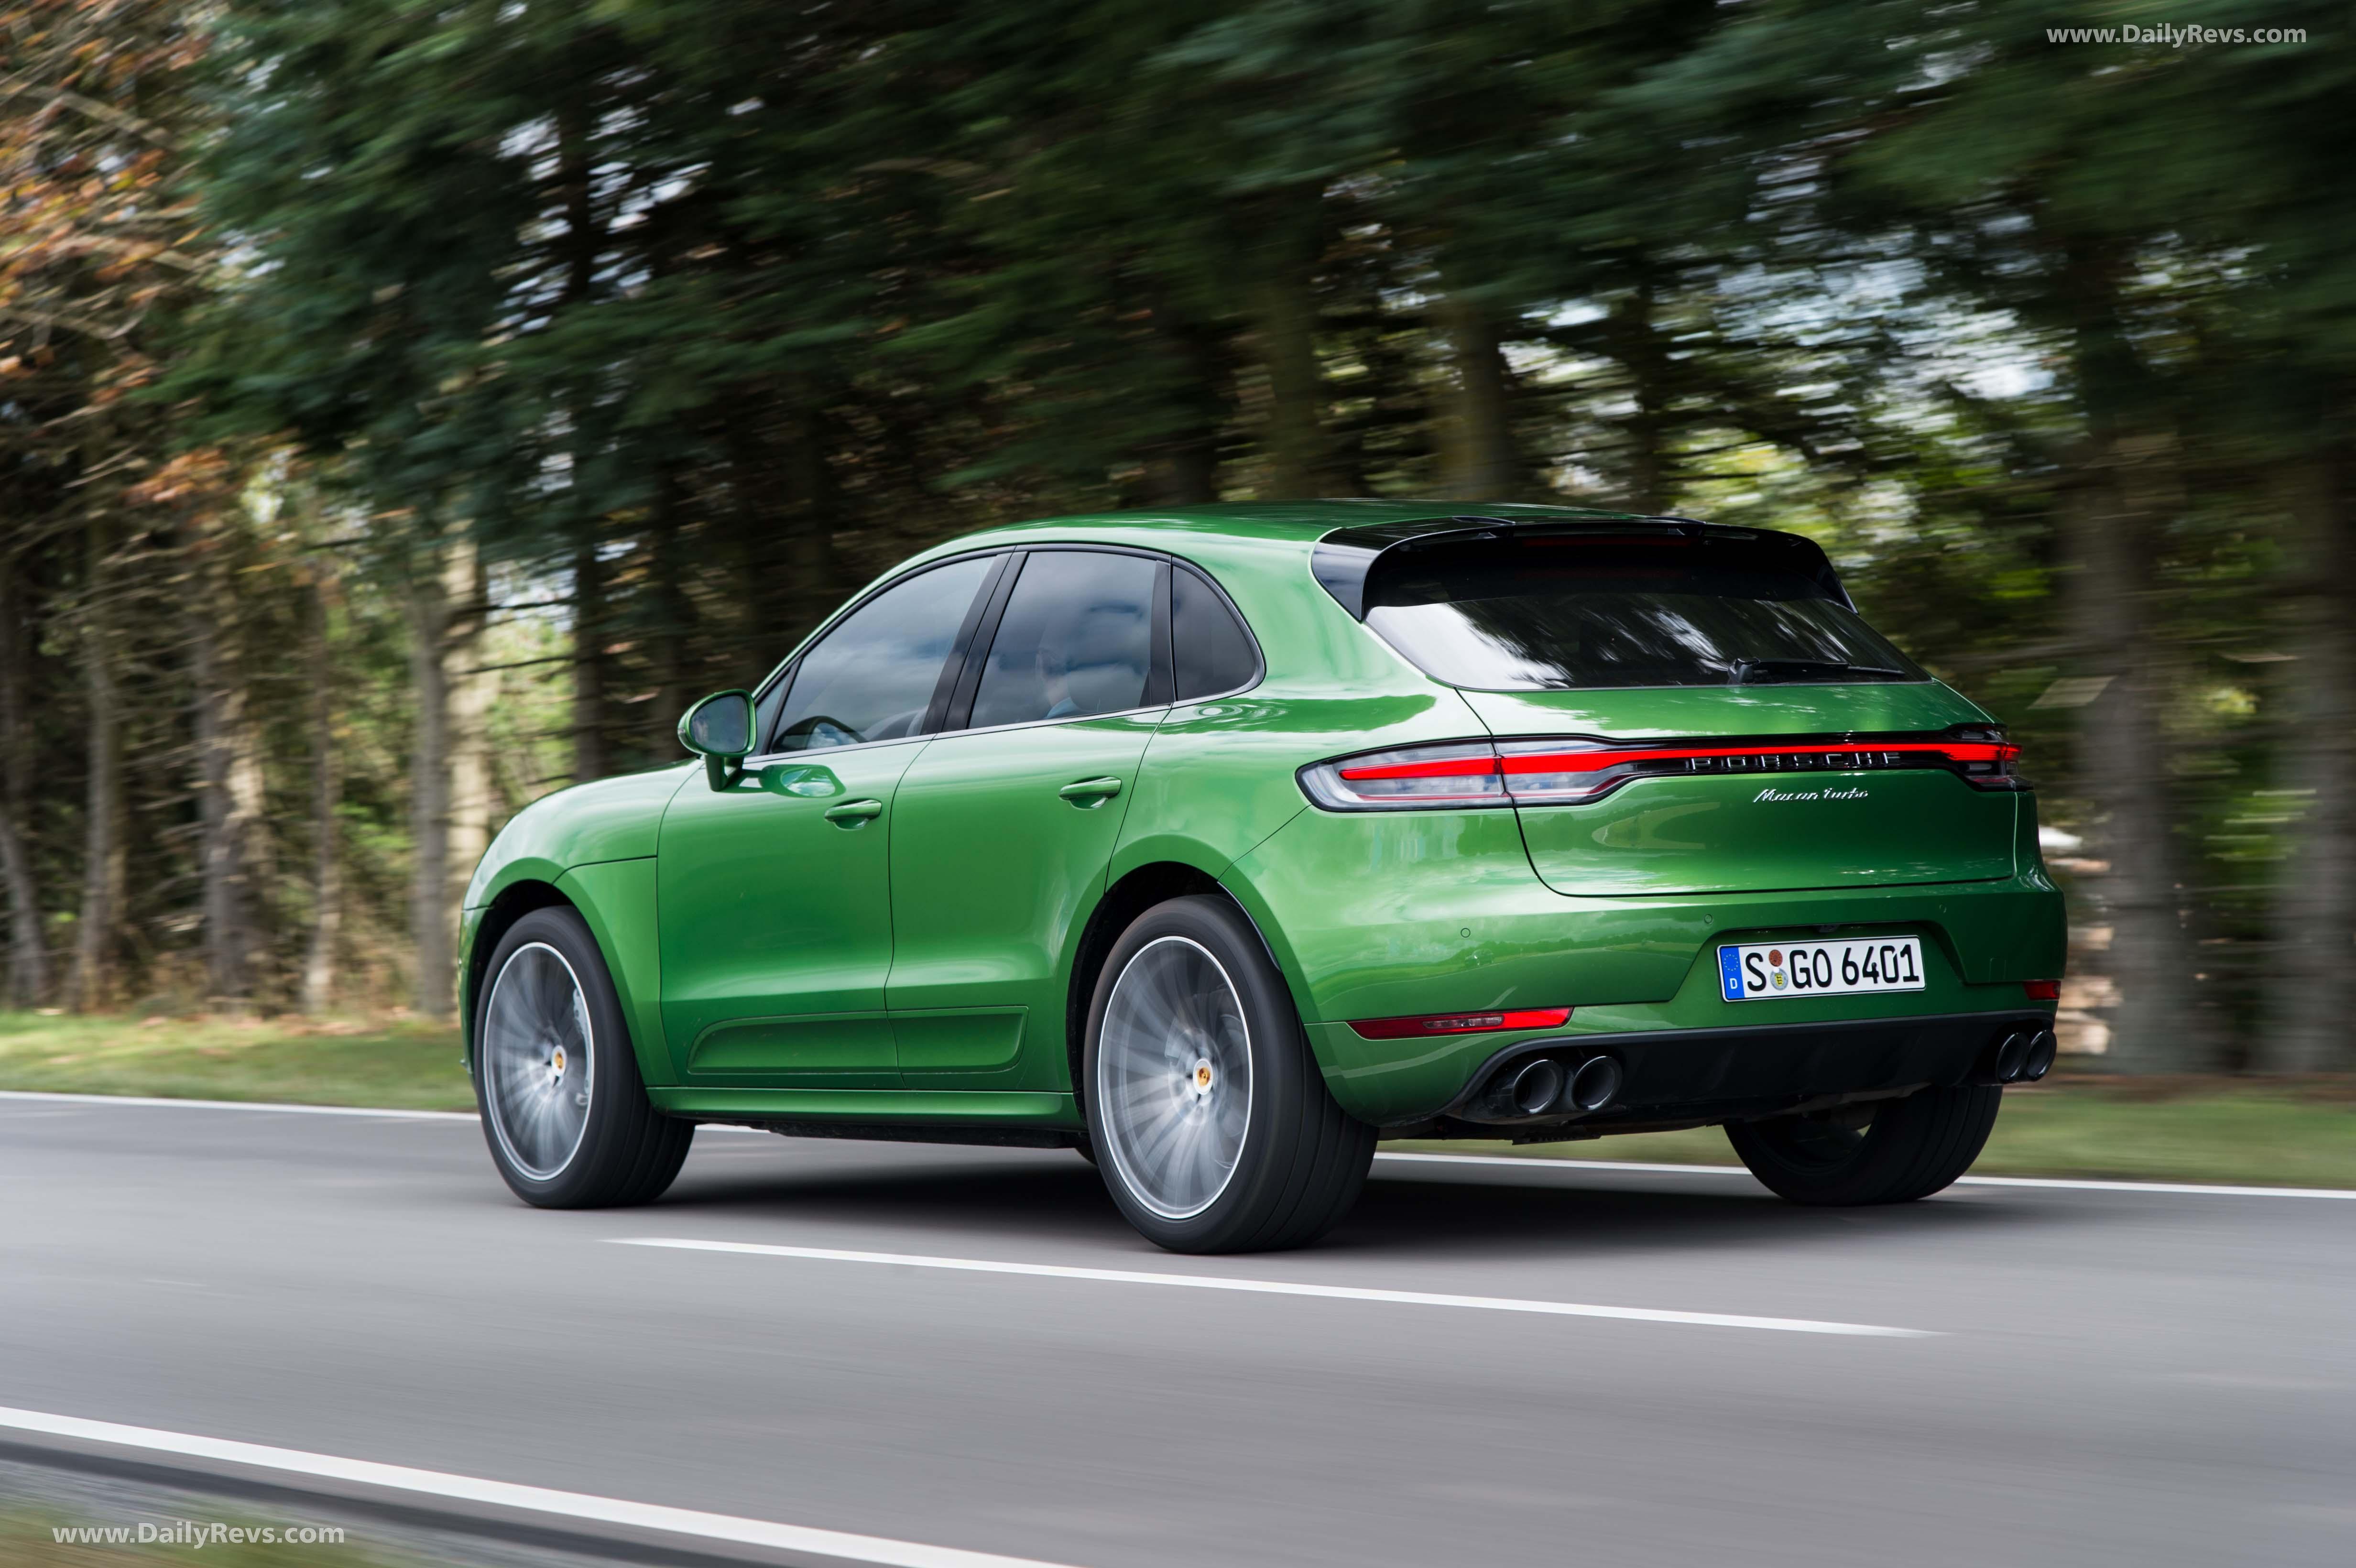 2019 Porsche Macan Turbo - HQ Pictures, Specs, Information & Videos - Dailyrevs